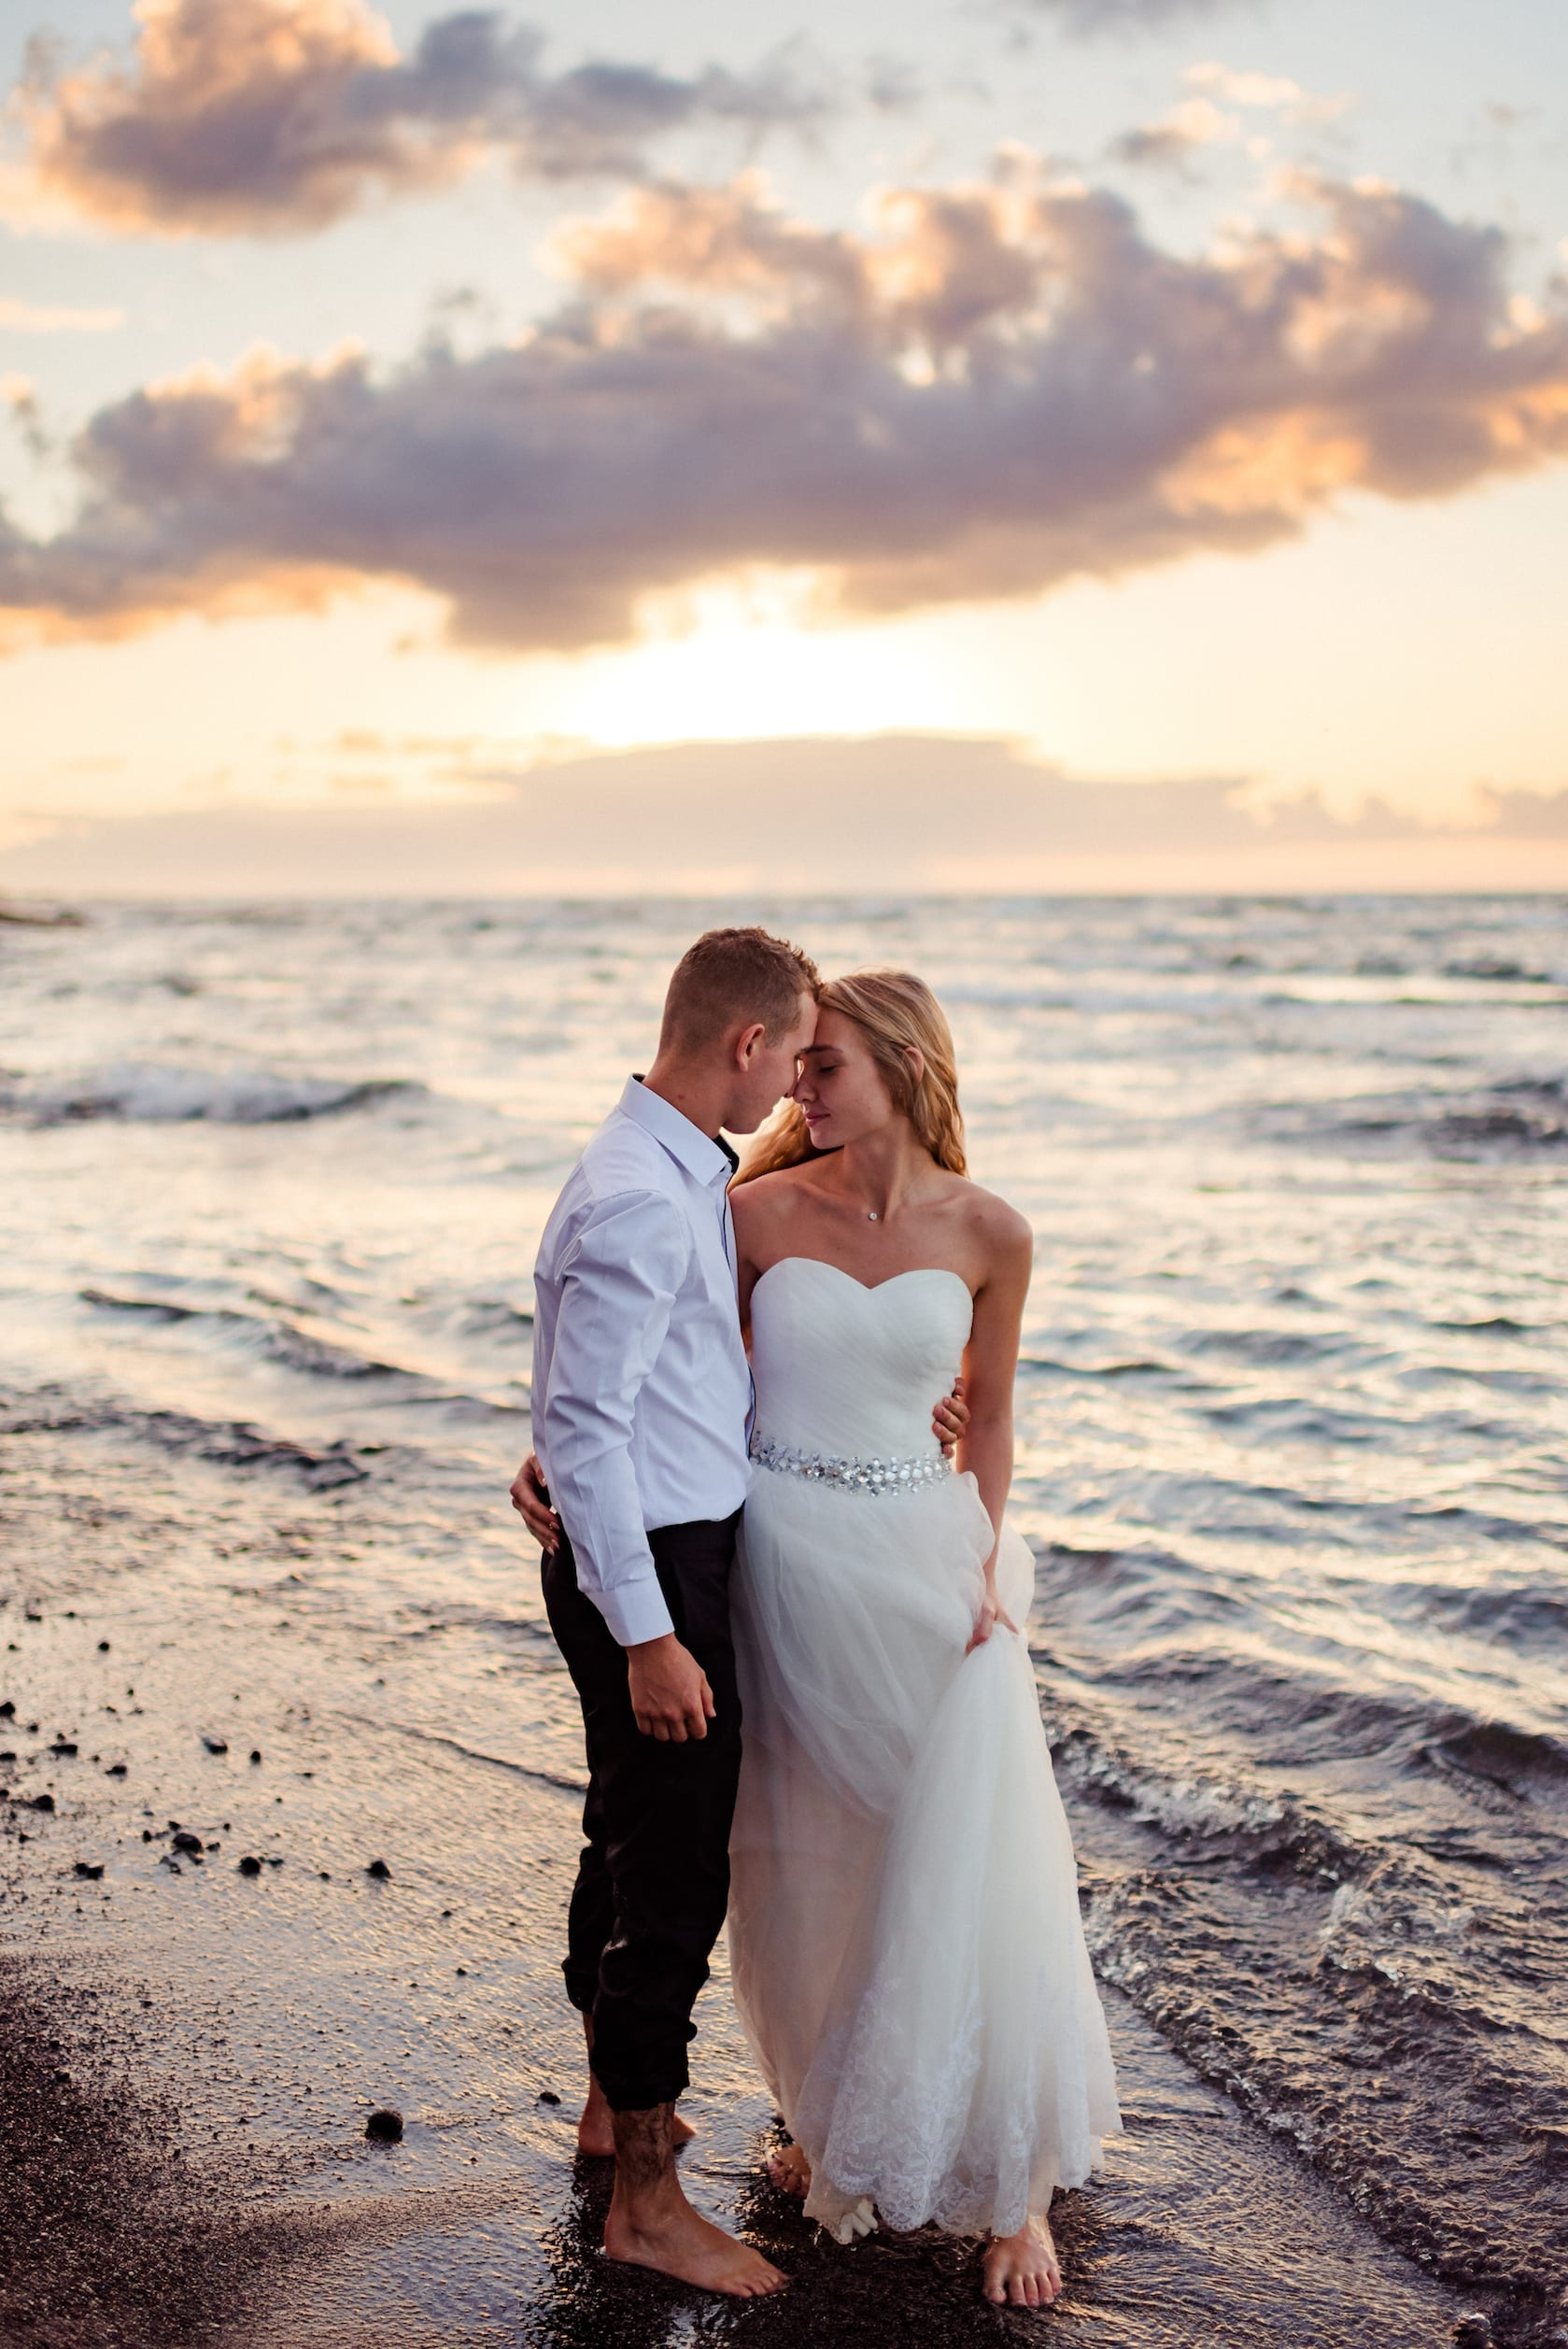 Big-Island-Elopement-Private-Wedding-Hawaii-Beach-17.jpg